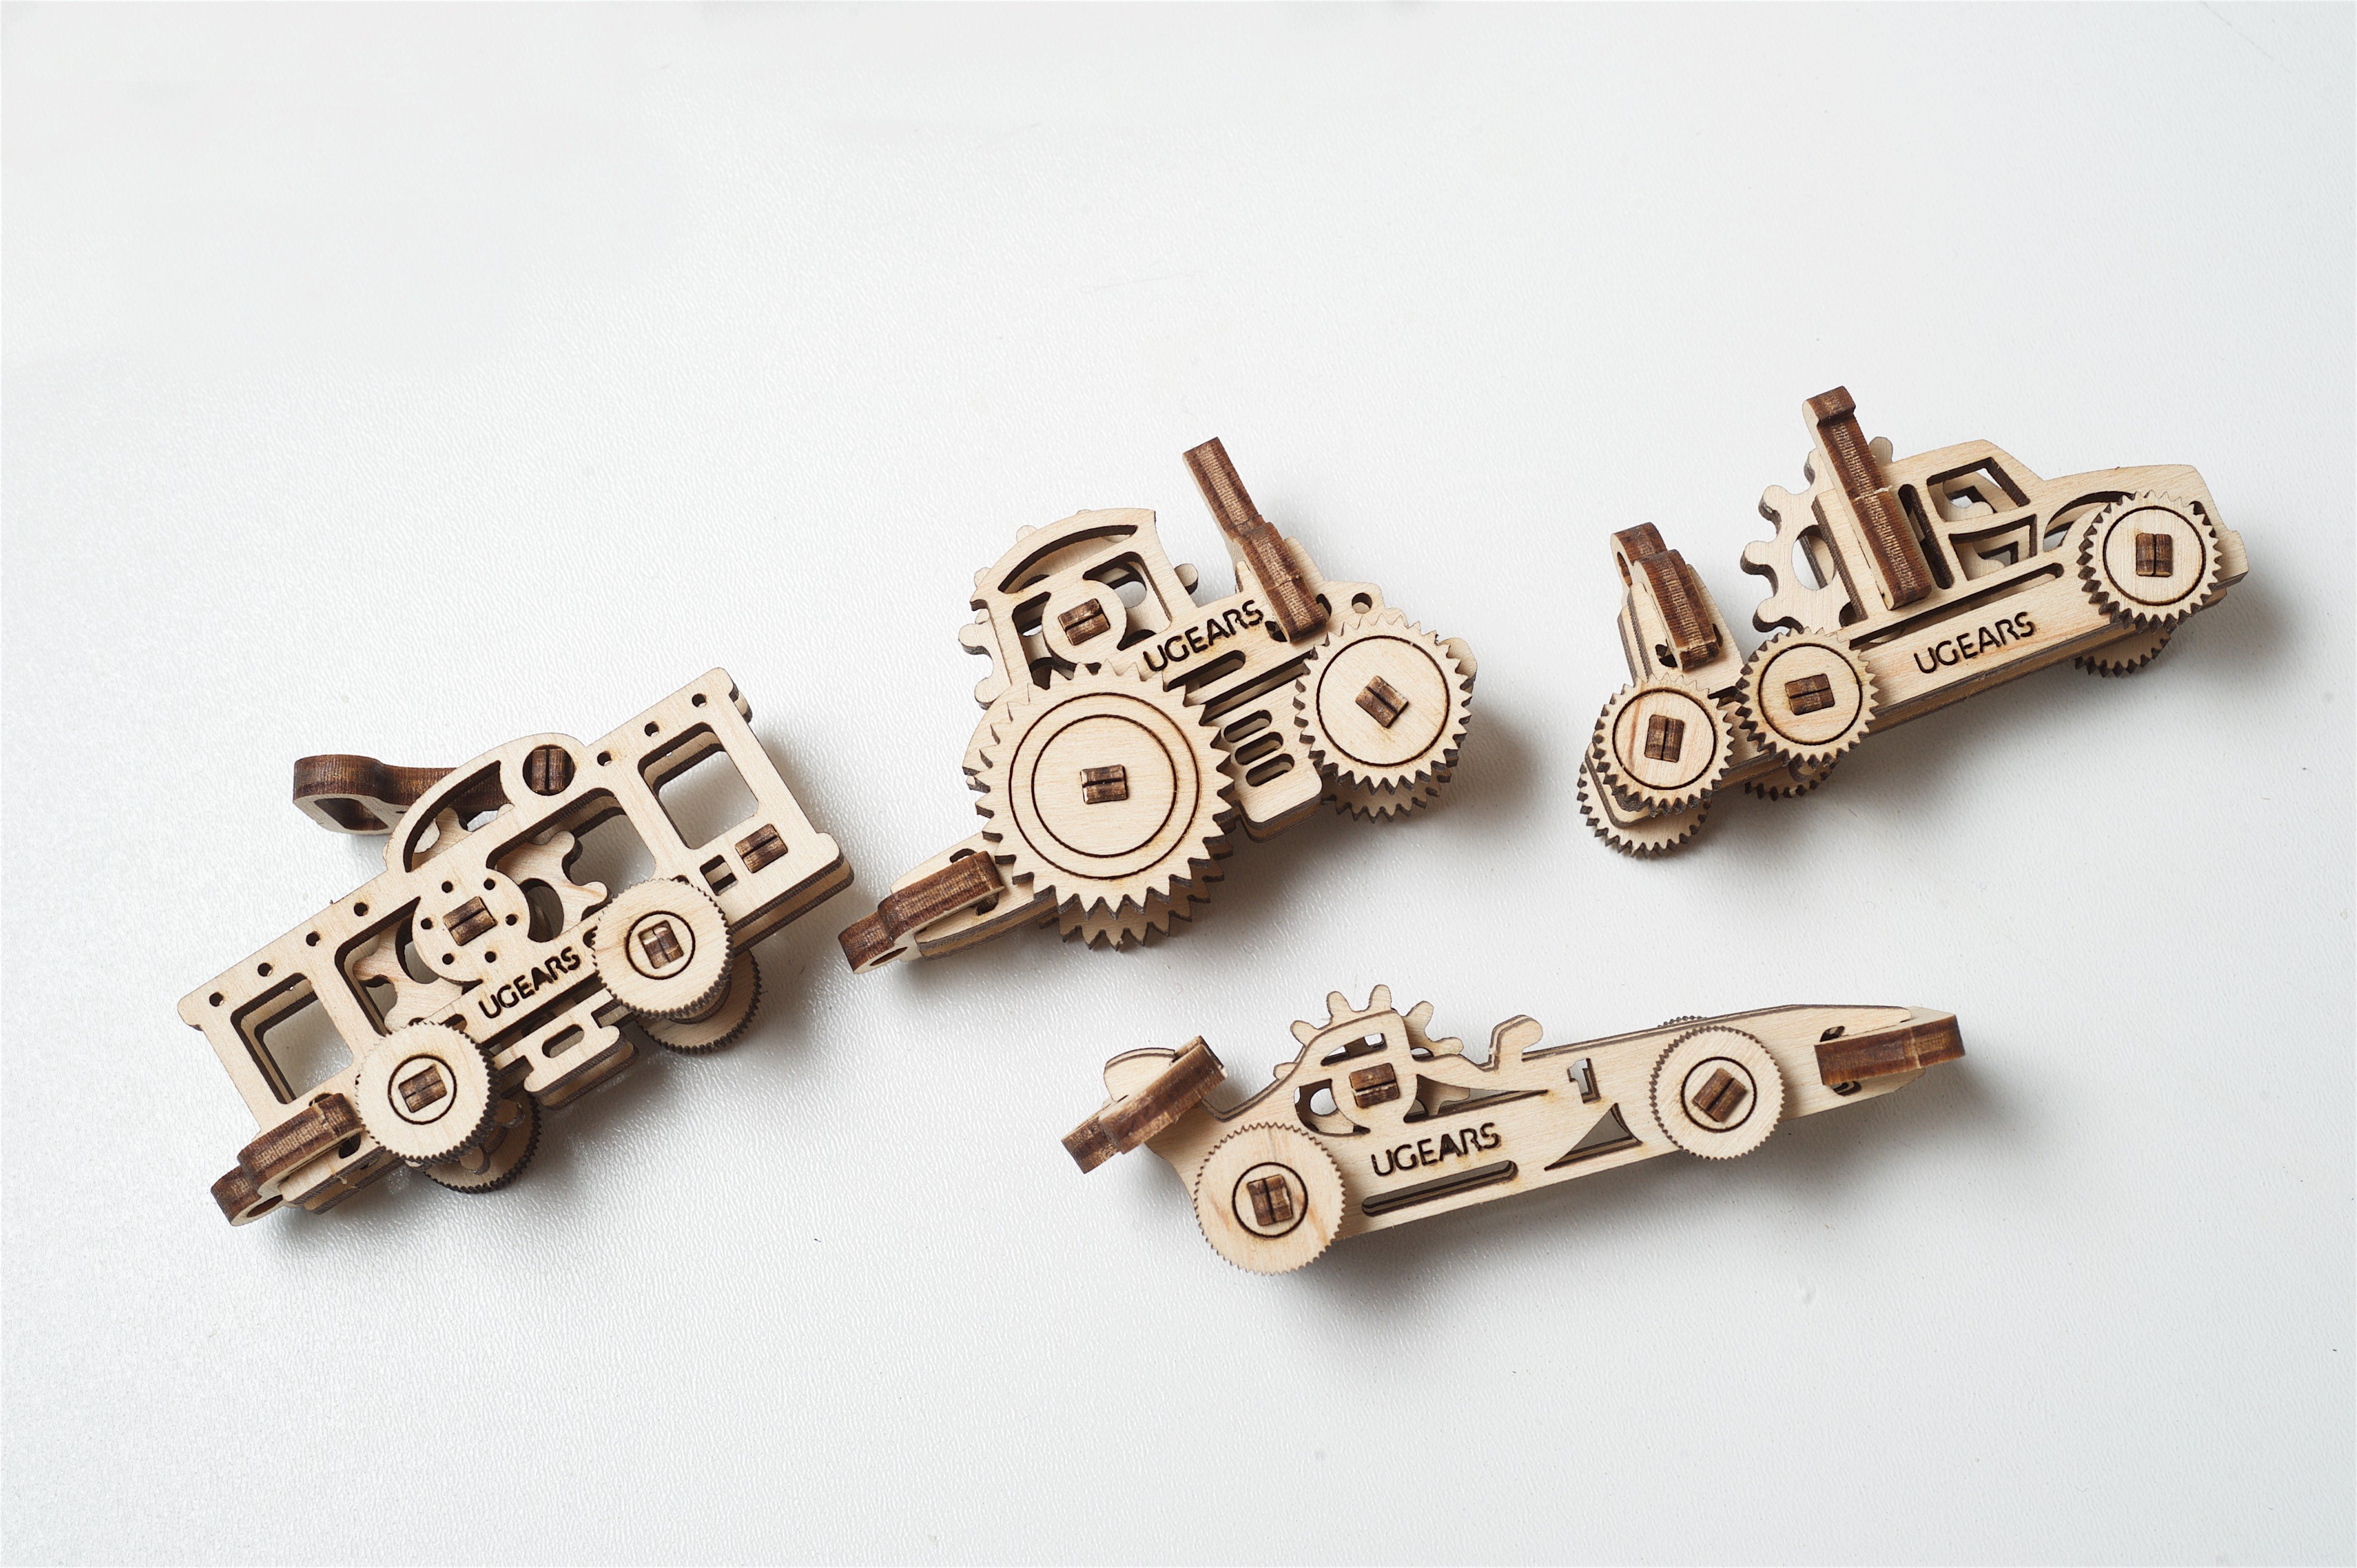 Конструктор 3D-пазл Ugears Фиджет Транспорт в Ярославле